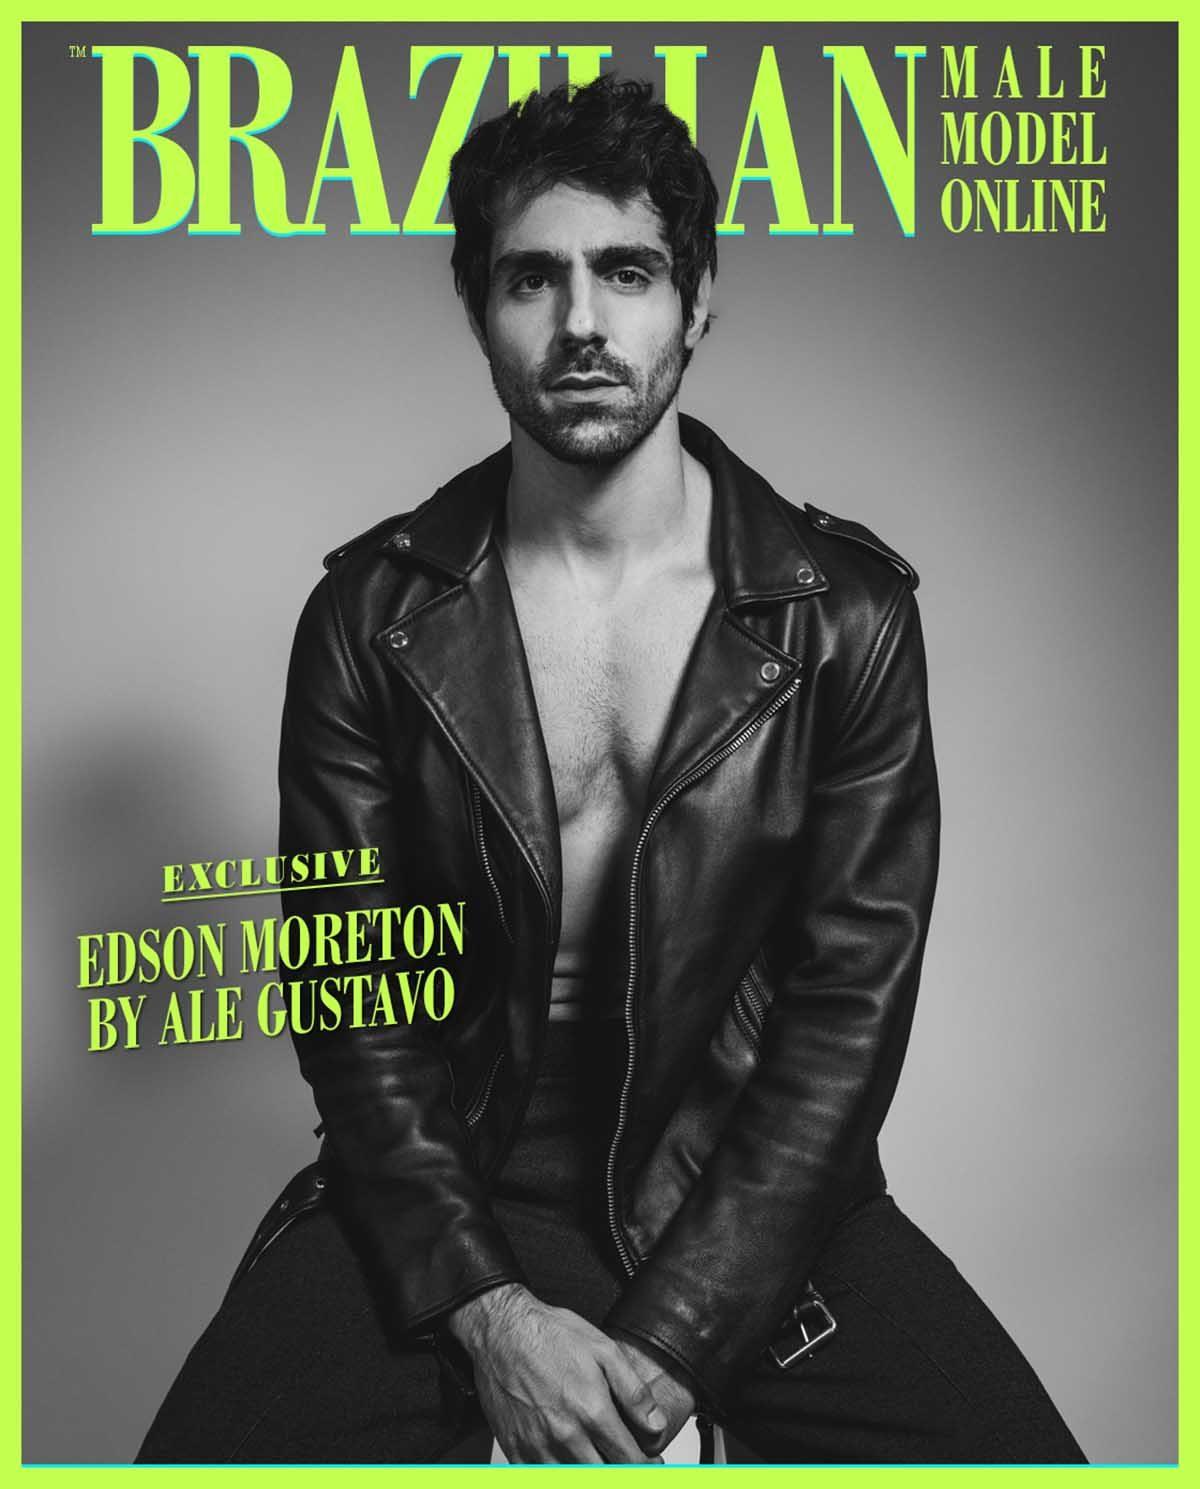 Edson Moreton by Ale Gustavo